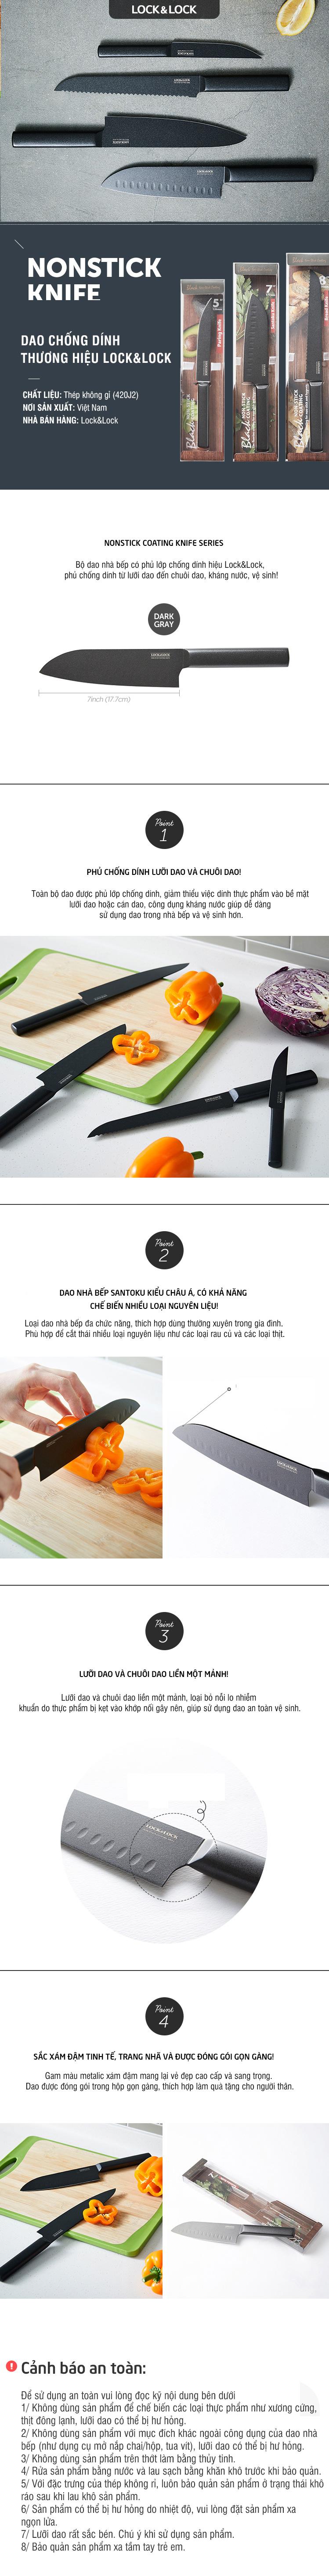 Dao Nhà Bếp Santoku Knife